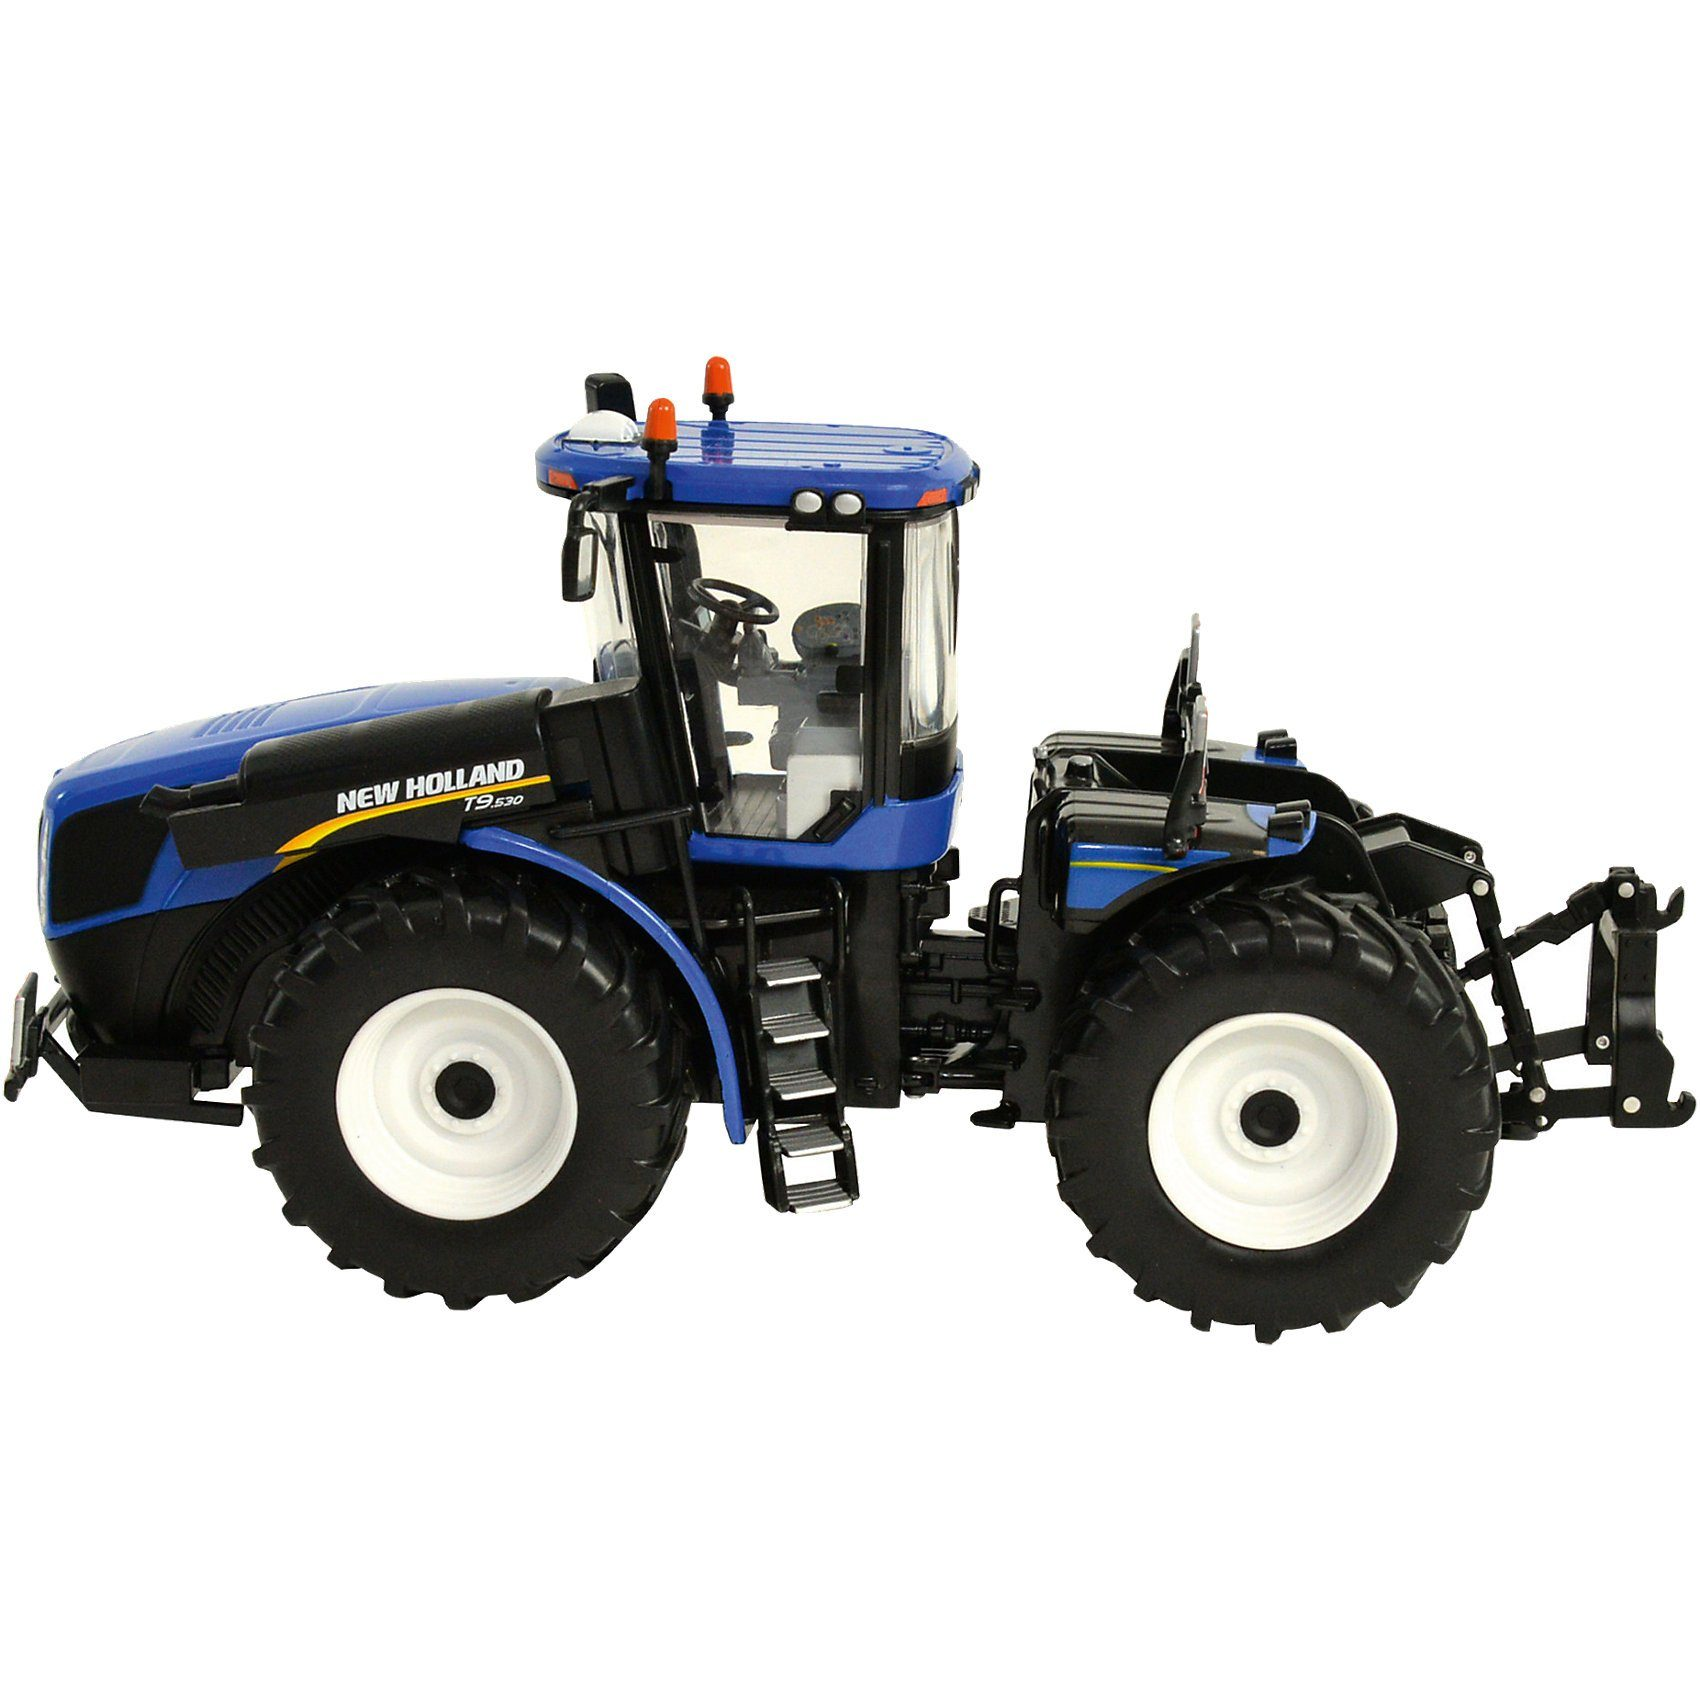 TOMY Britains New Holland - T9.530 Traktor 1:32